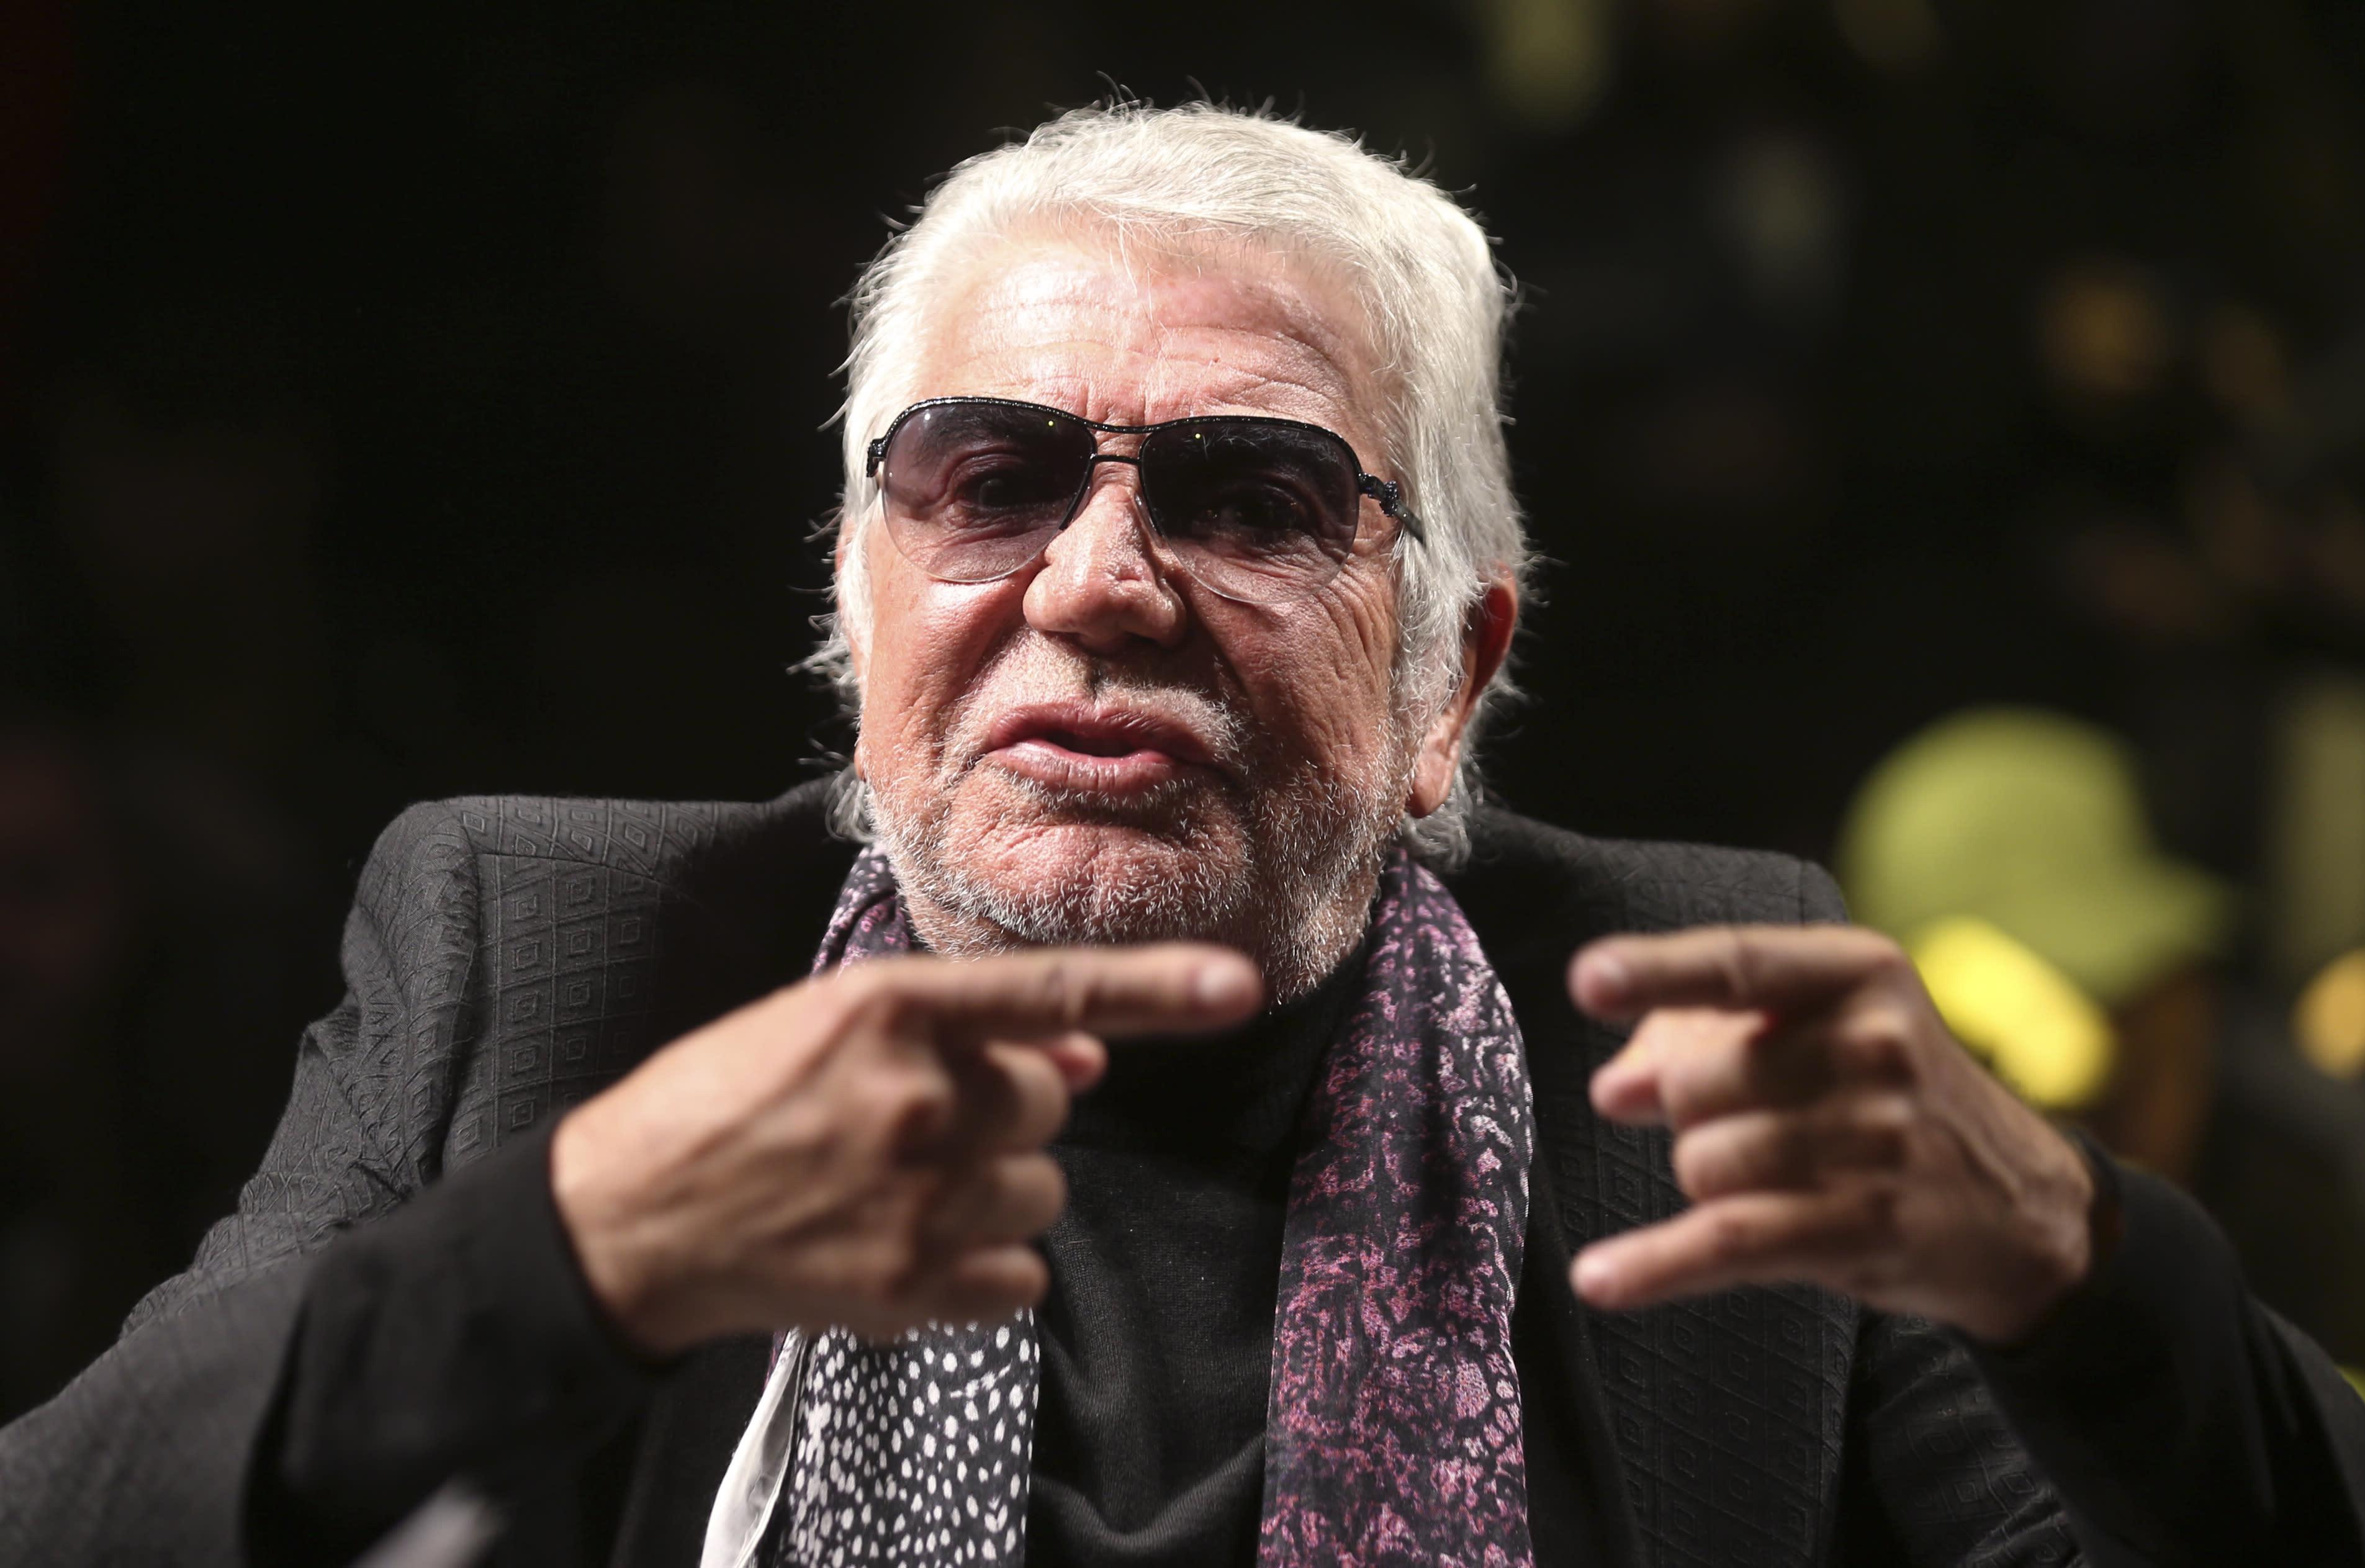 Milan Designers Offer Softer Silhouette For Men